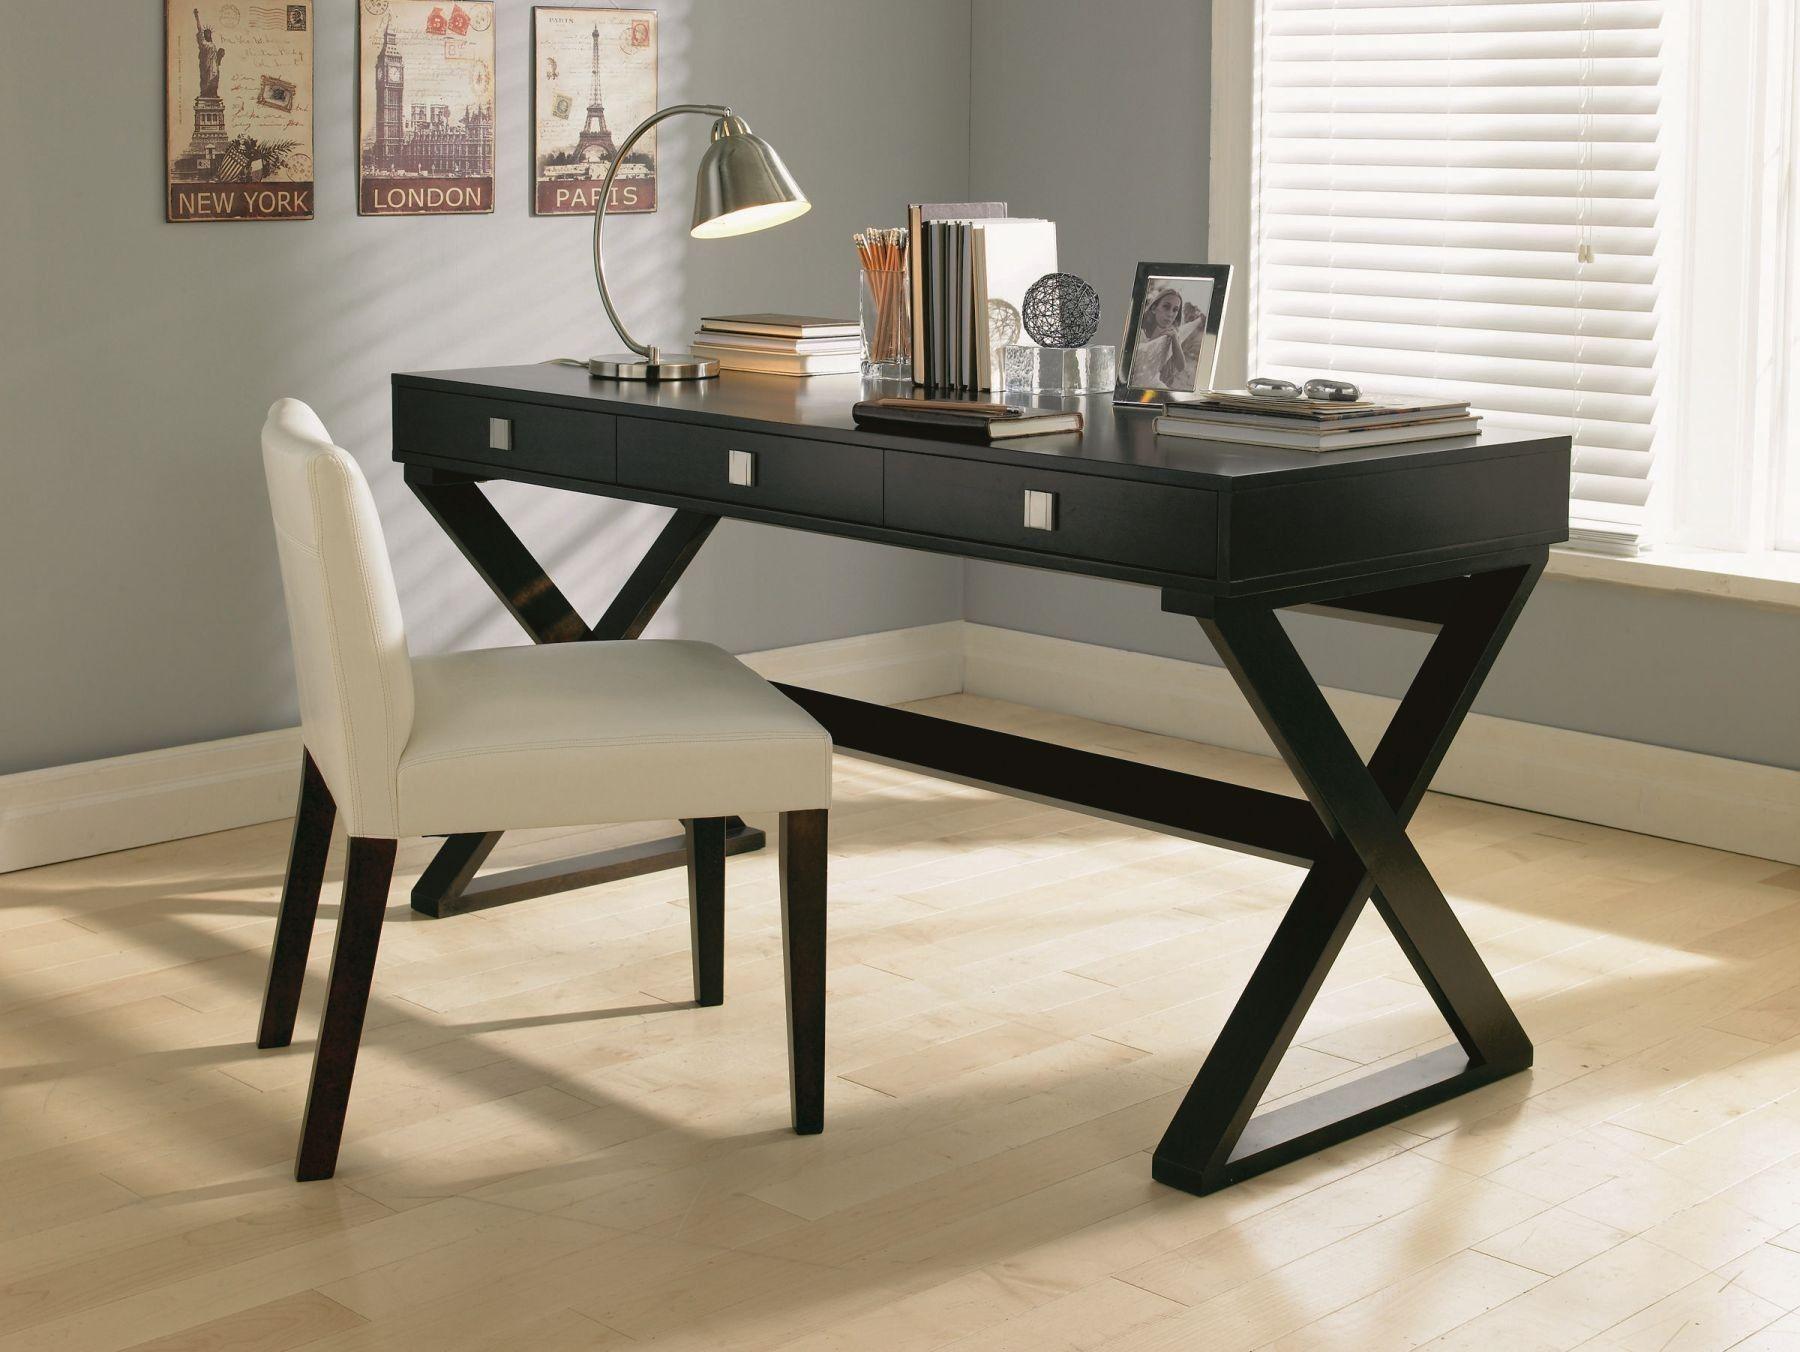 Best Kitchen Gallery: Designer Home Office Furniture Desk Ideas For Office Home Home of Designer Desks For Home  on rachelxblog.com